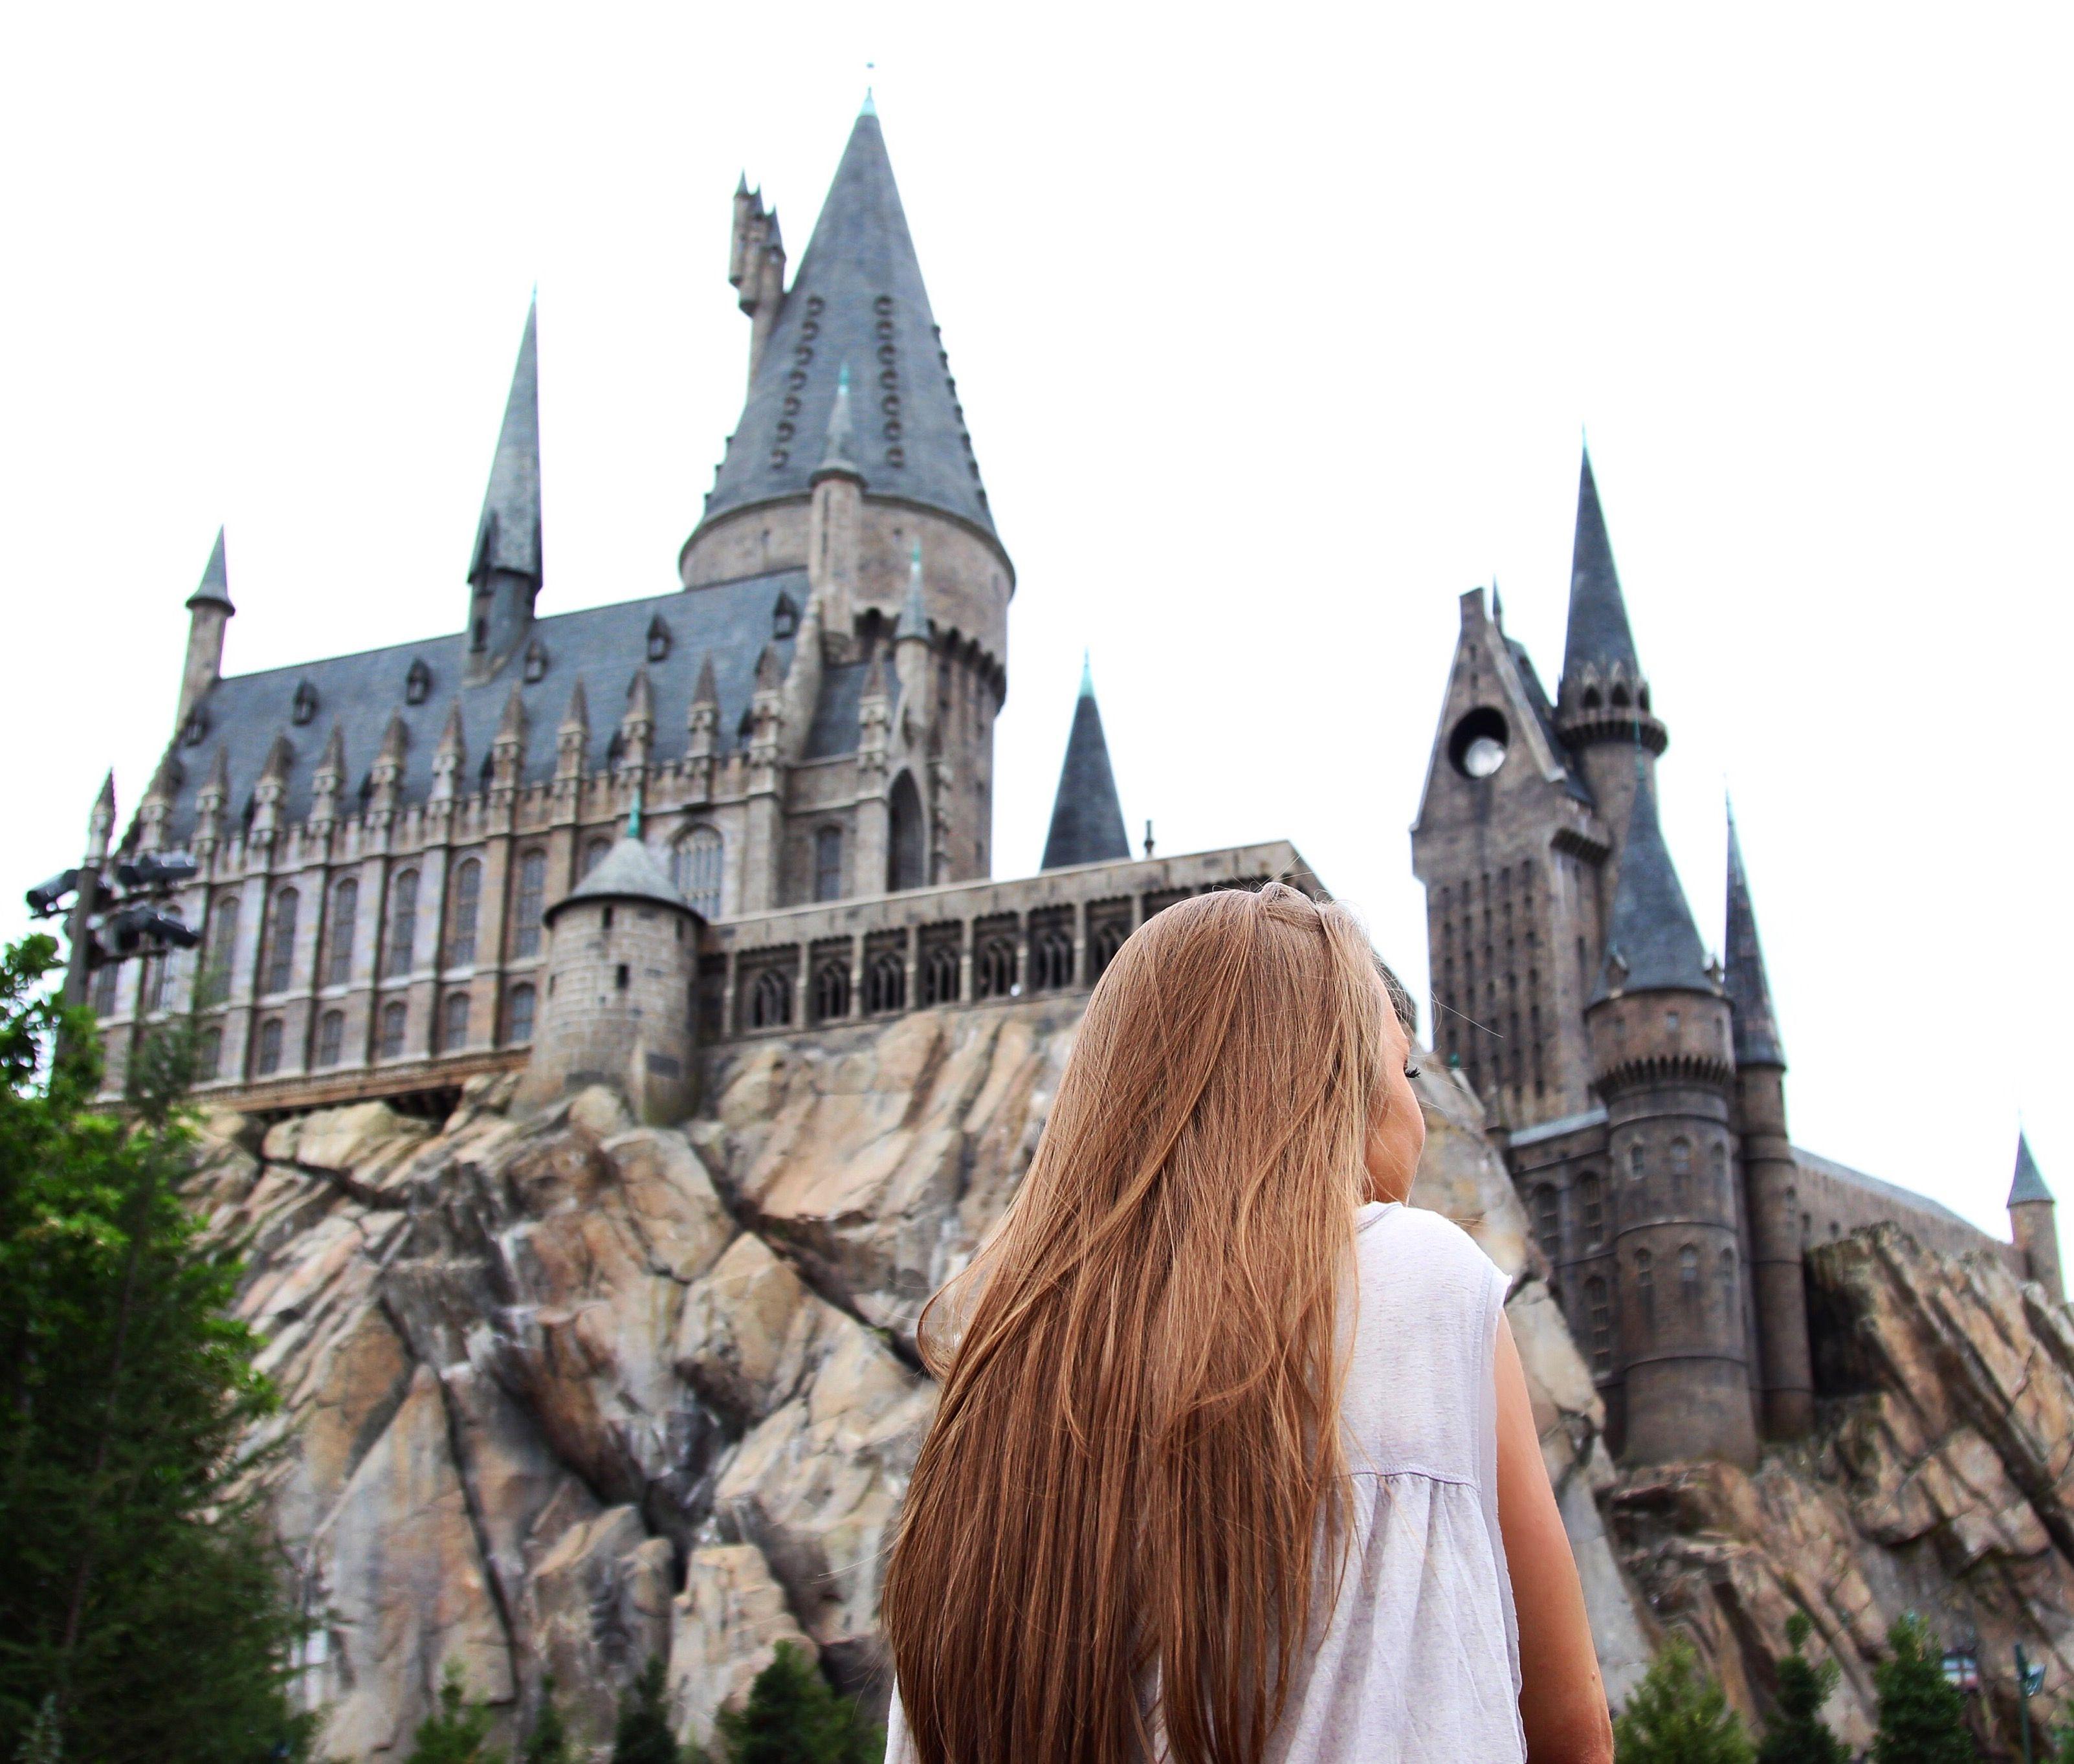 Harry Potter World Wedding: Harry Potter World Orlando Picture Inspiration. Travel